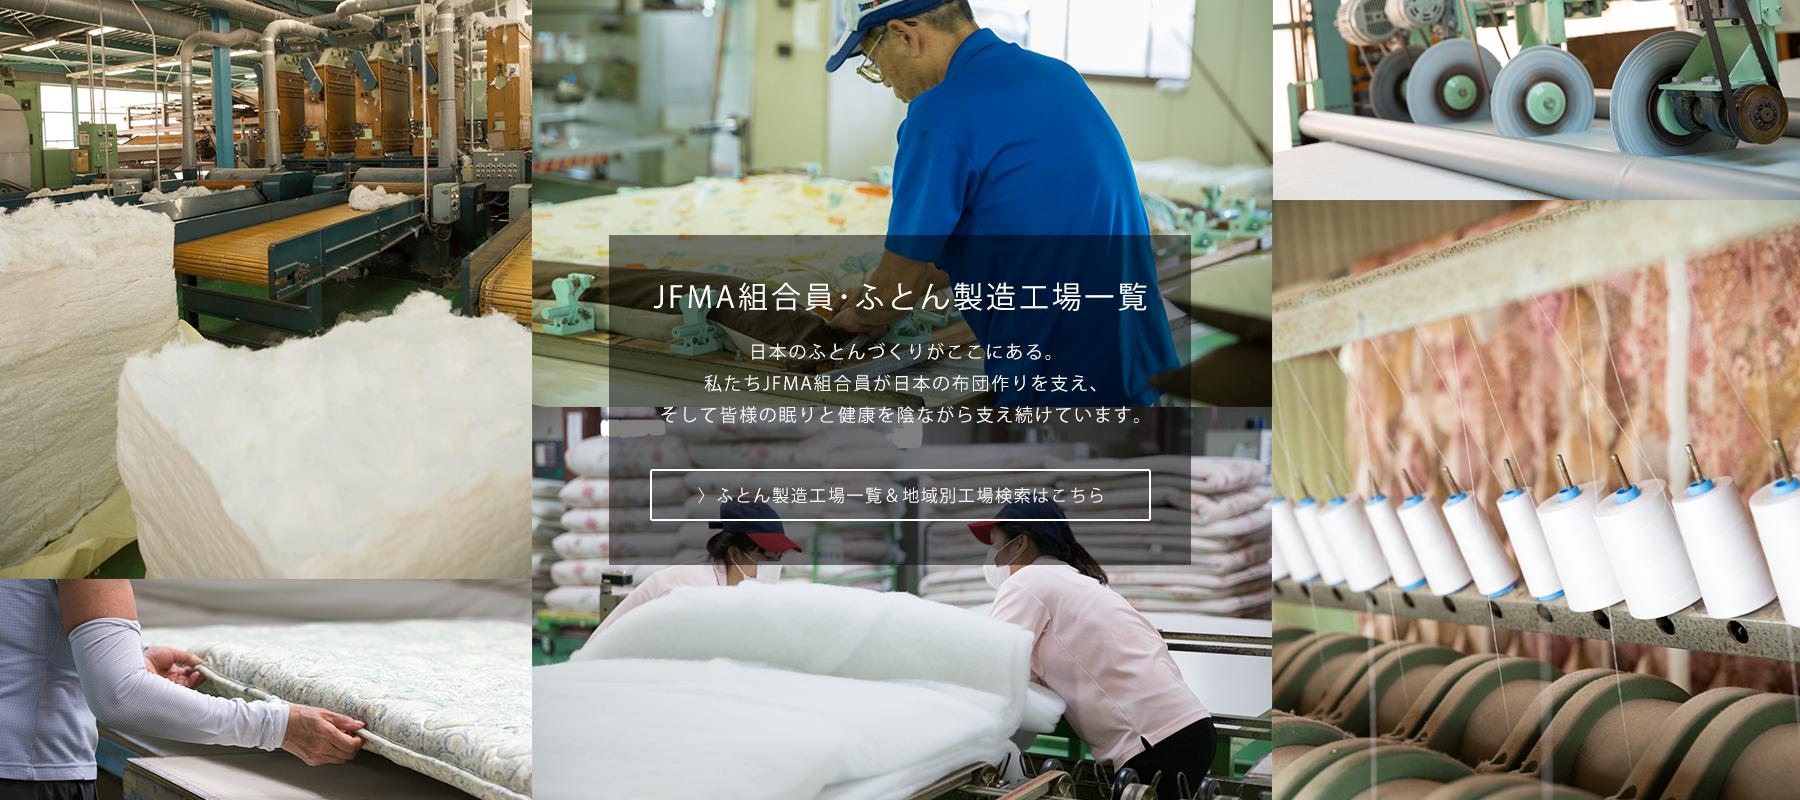 JFMA組合員・ふとん製造工場一覧